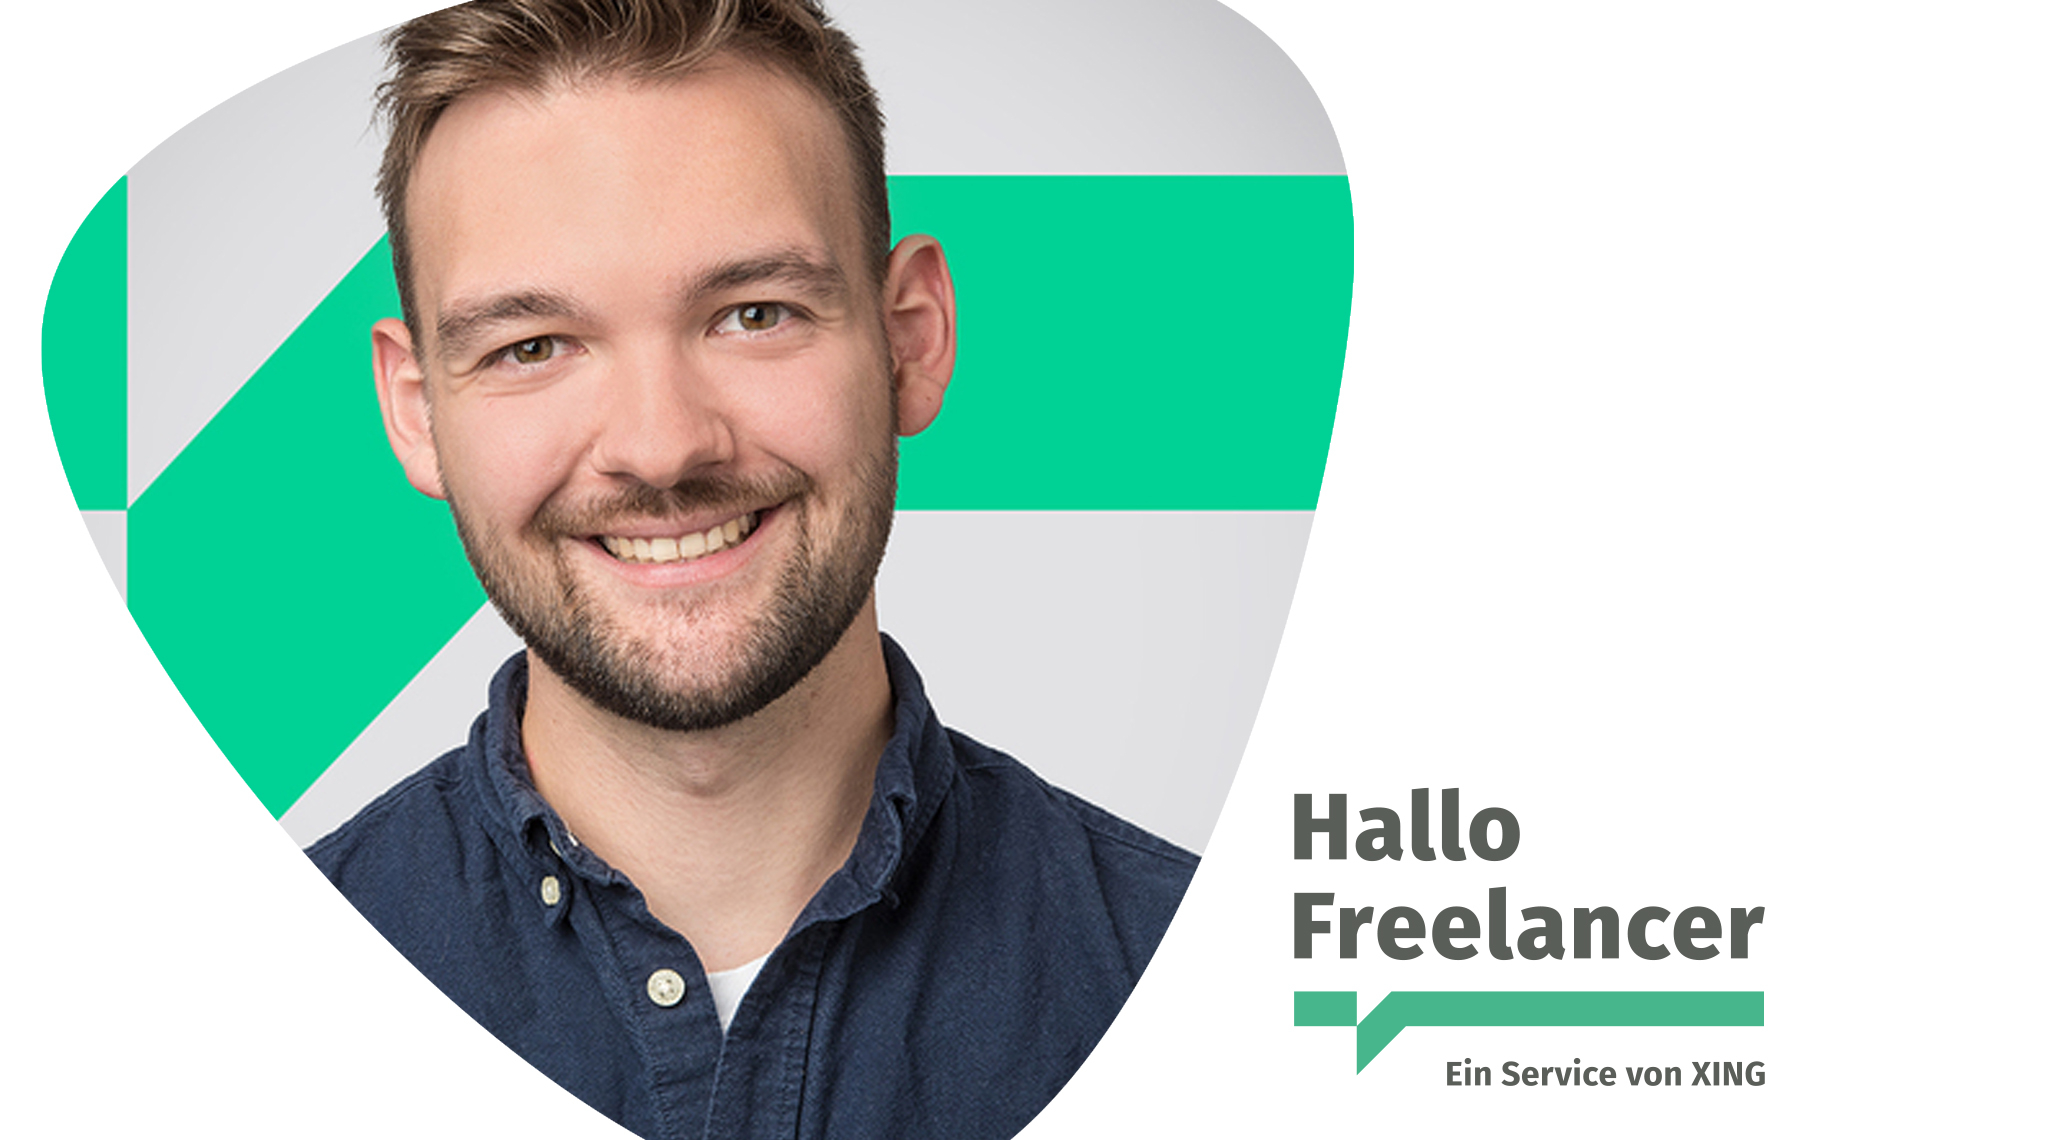 HalloFreelancer